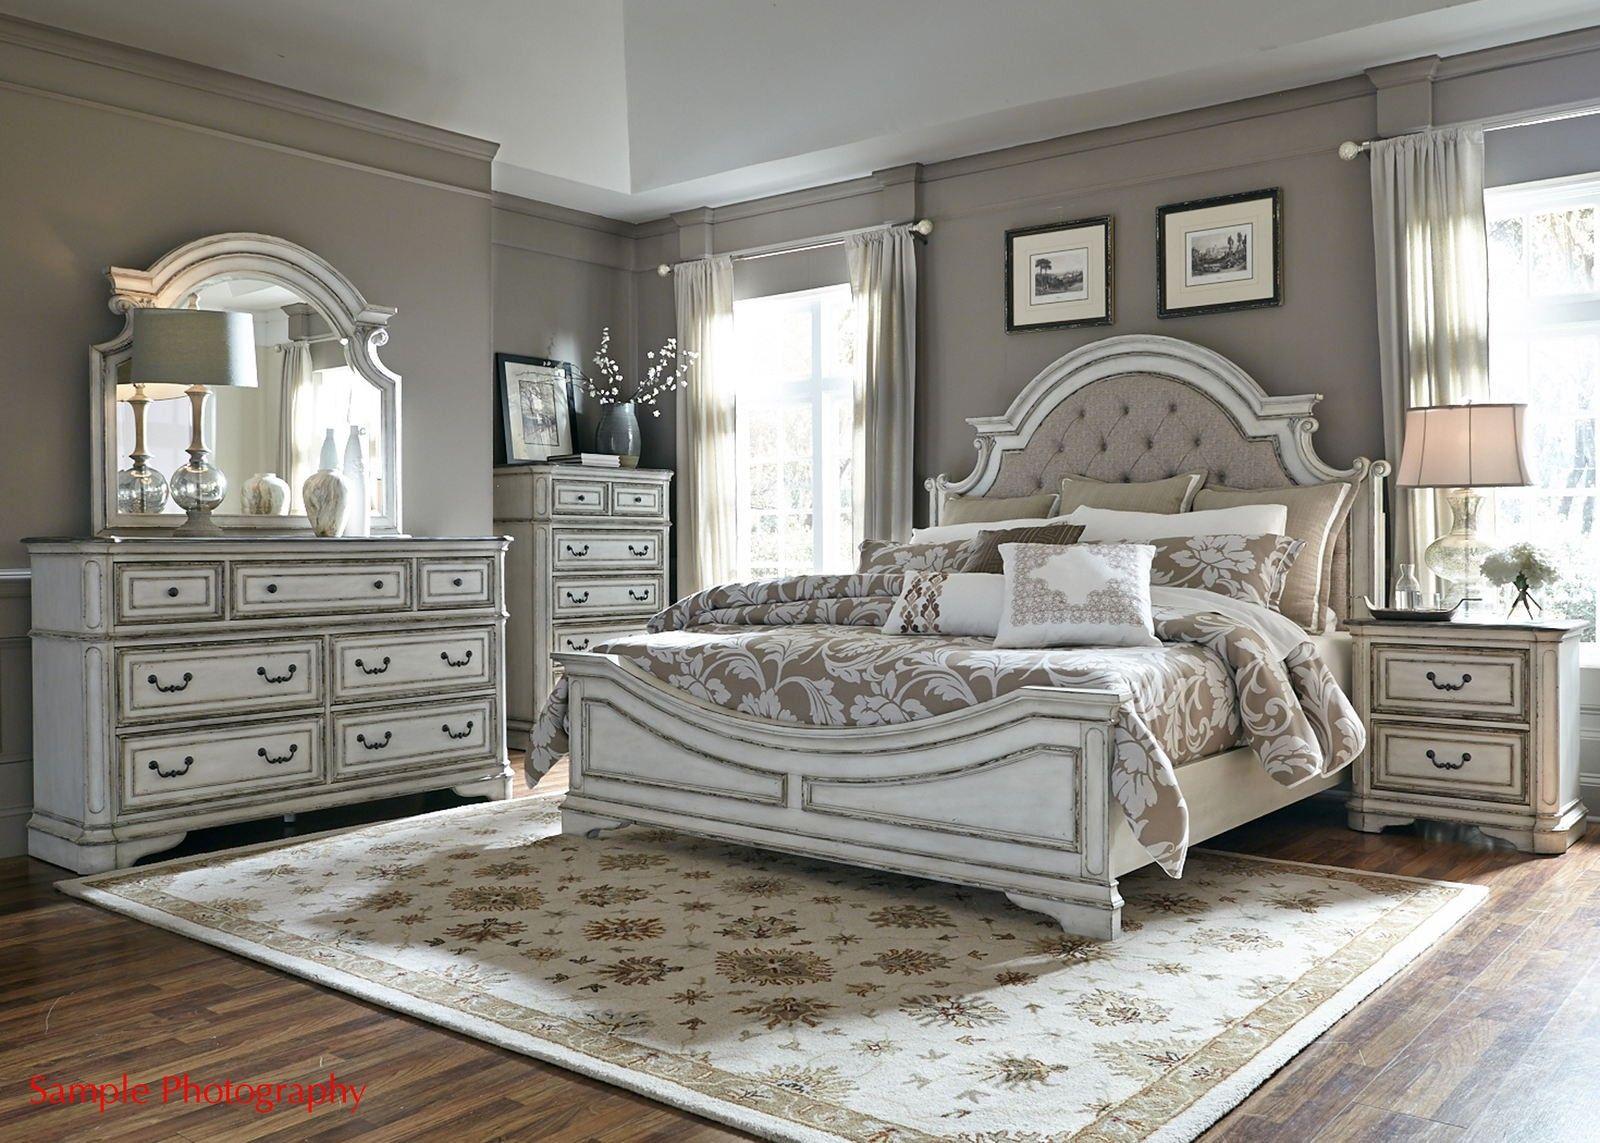 Liberty Magnolia Manor 4Piece Upholstered Bedroom Set in